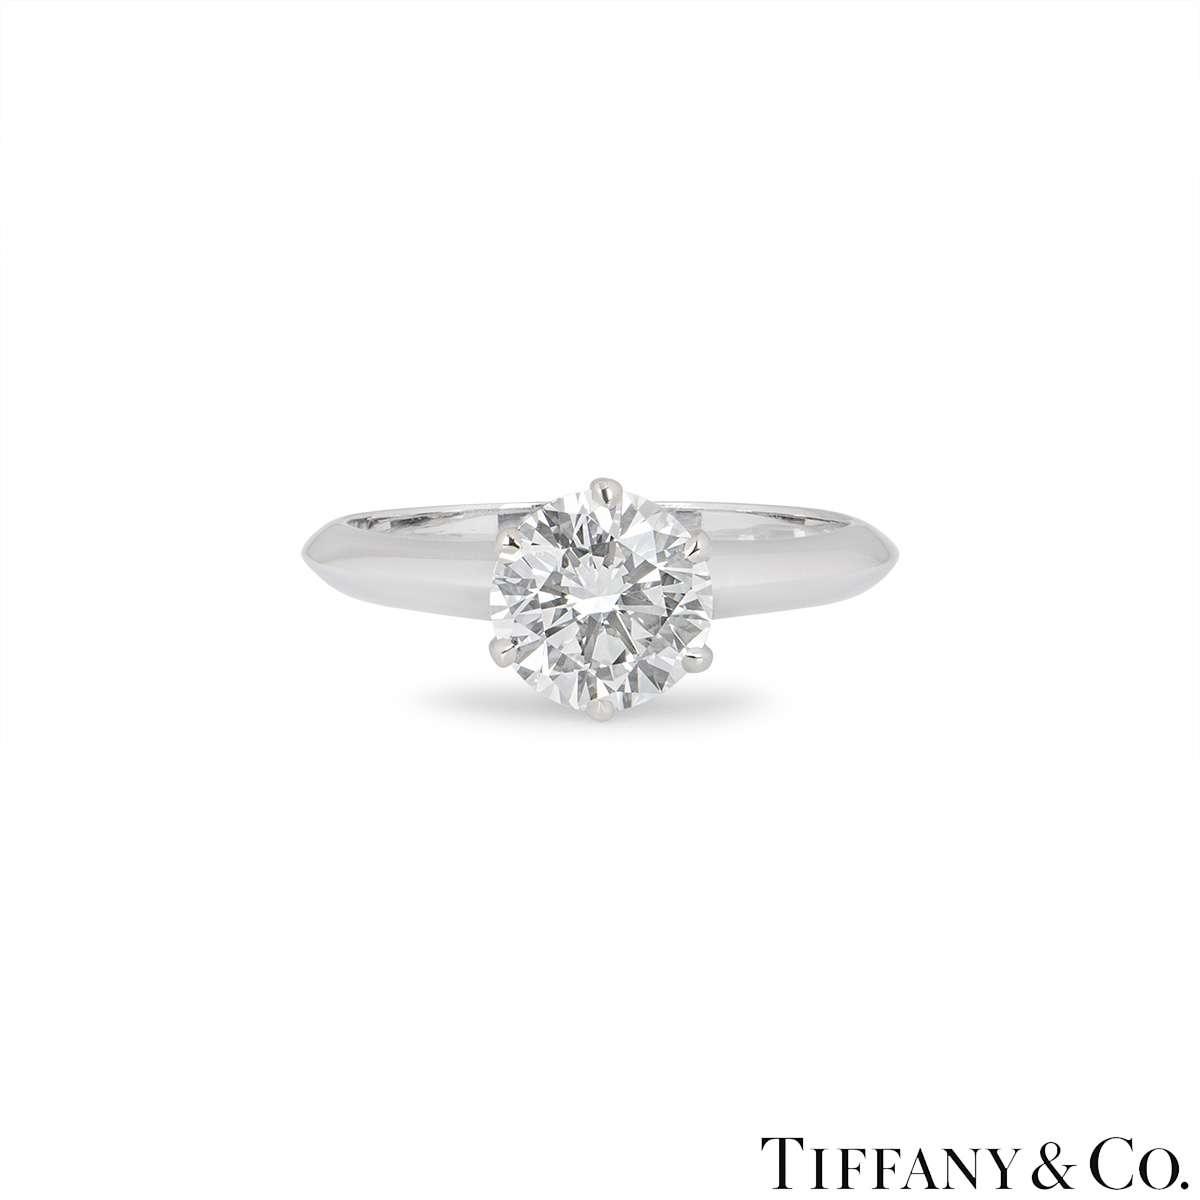 Tiffany & Co. Platinum Diamond Setting Ring 1.31ct G/VS2